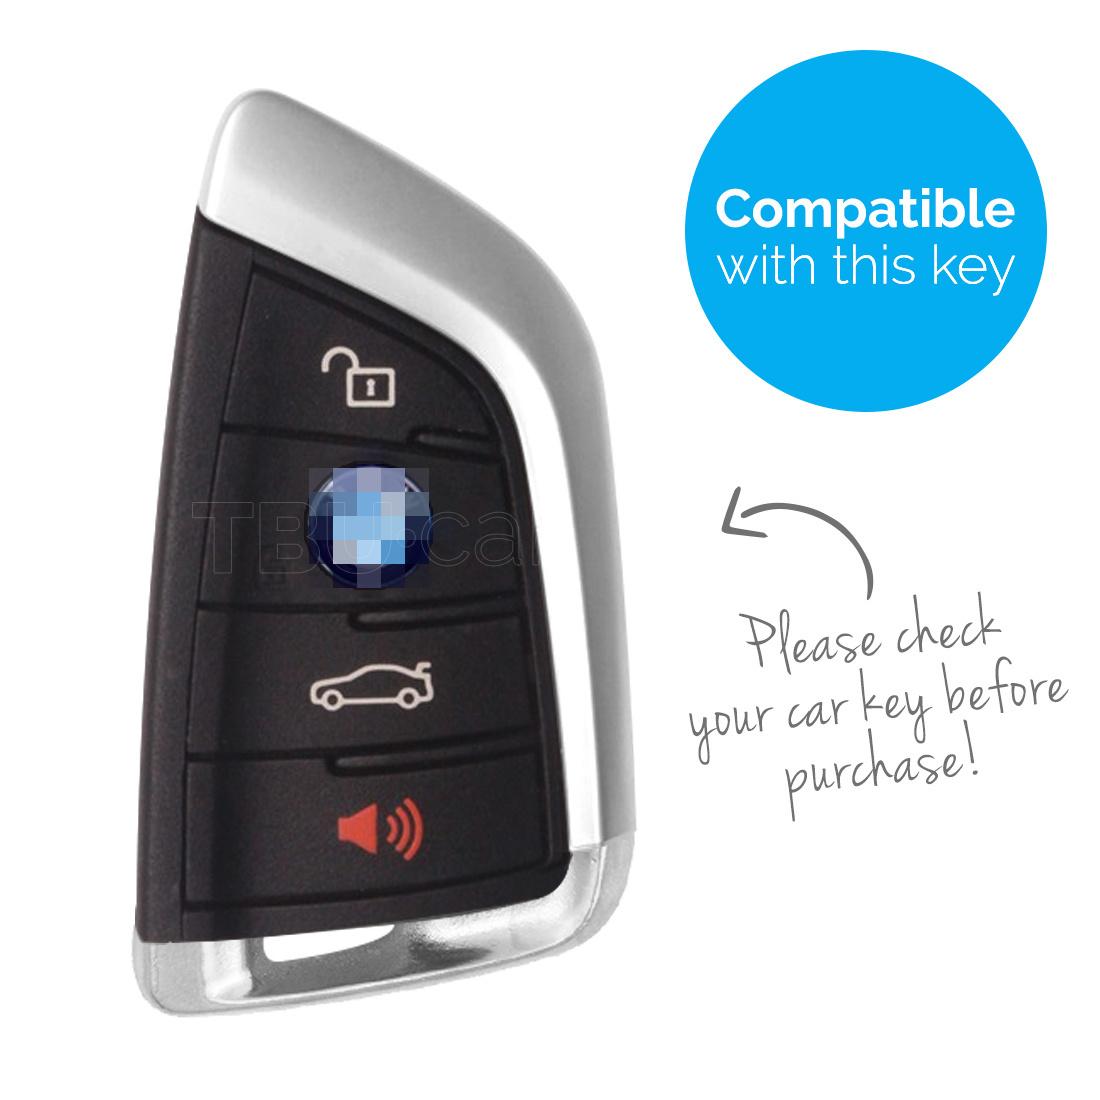 TBU car TBU car Autoschlüssel Hülle kompatibel mit BMW 4 Tasten (Keyless Entry) - Schutzhülle aus TPU - Auto Schlüsselhülle Cover in Roségold